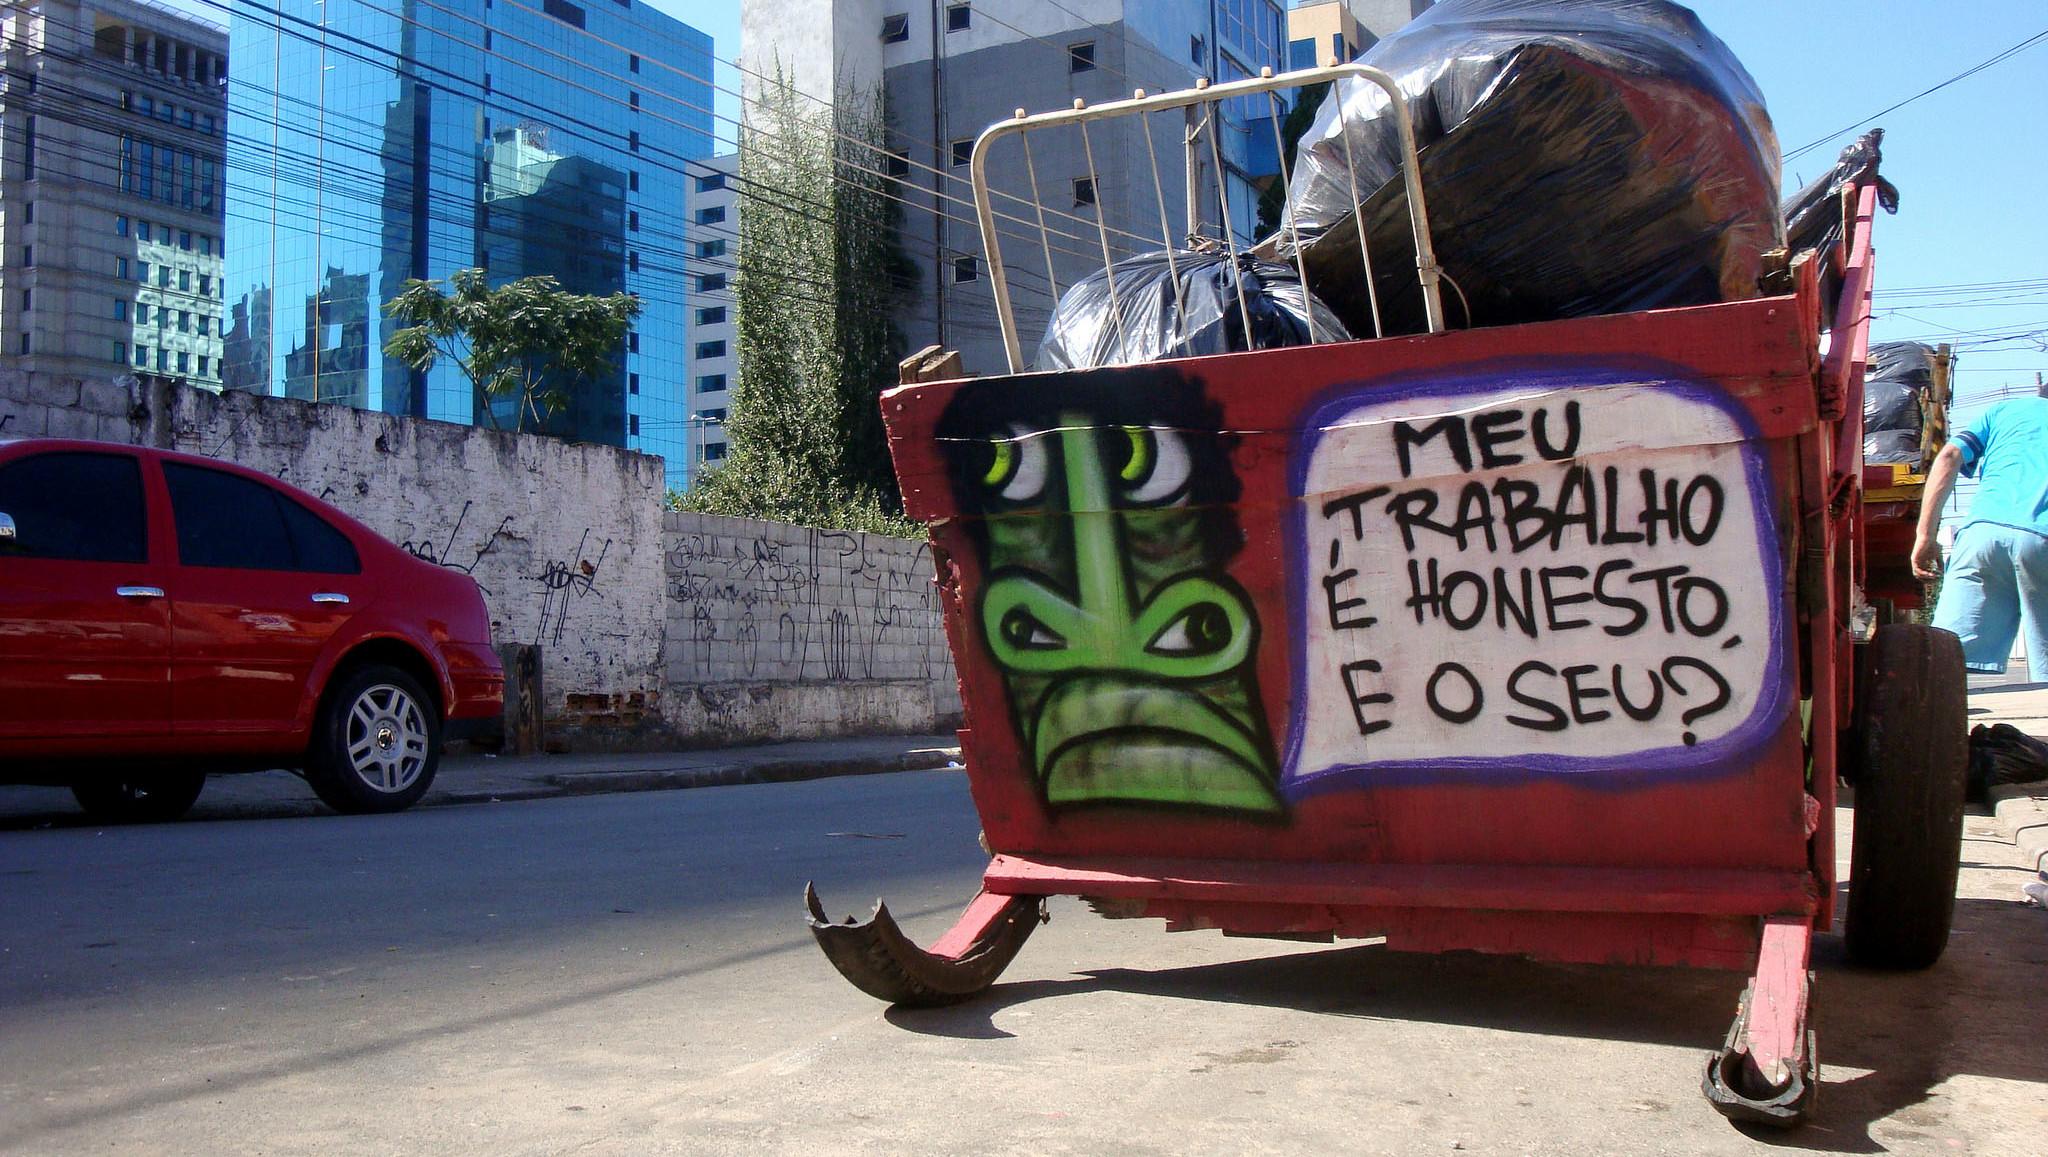 pimp-my-carroça-mundano-social-arte-ambiental-5